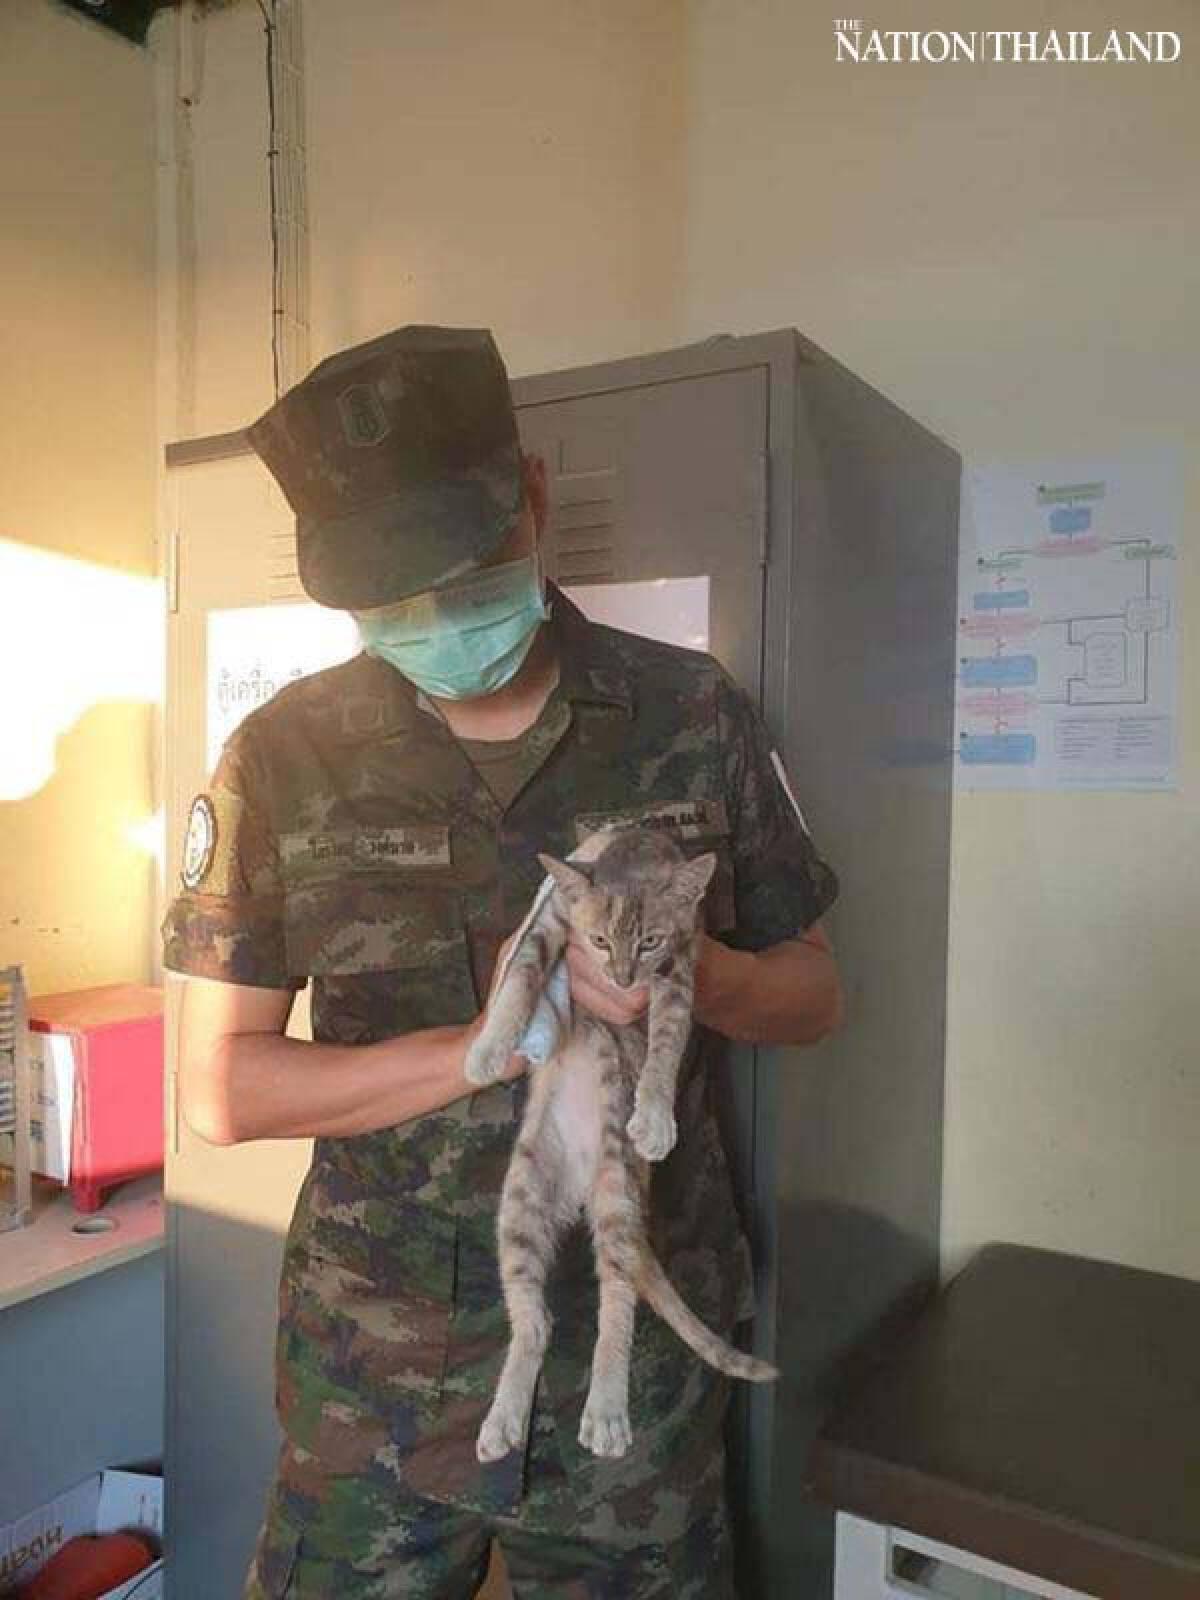 Photo credit: Royal Thai Navy